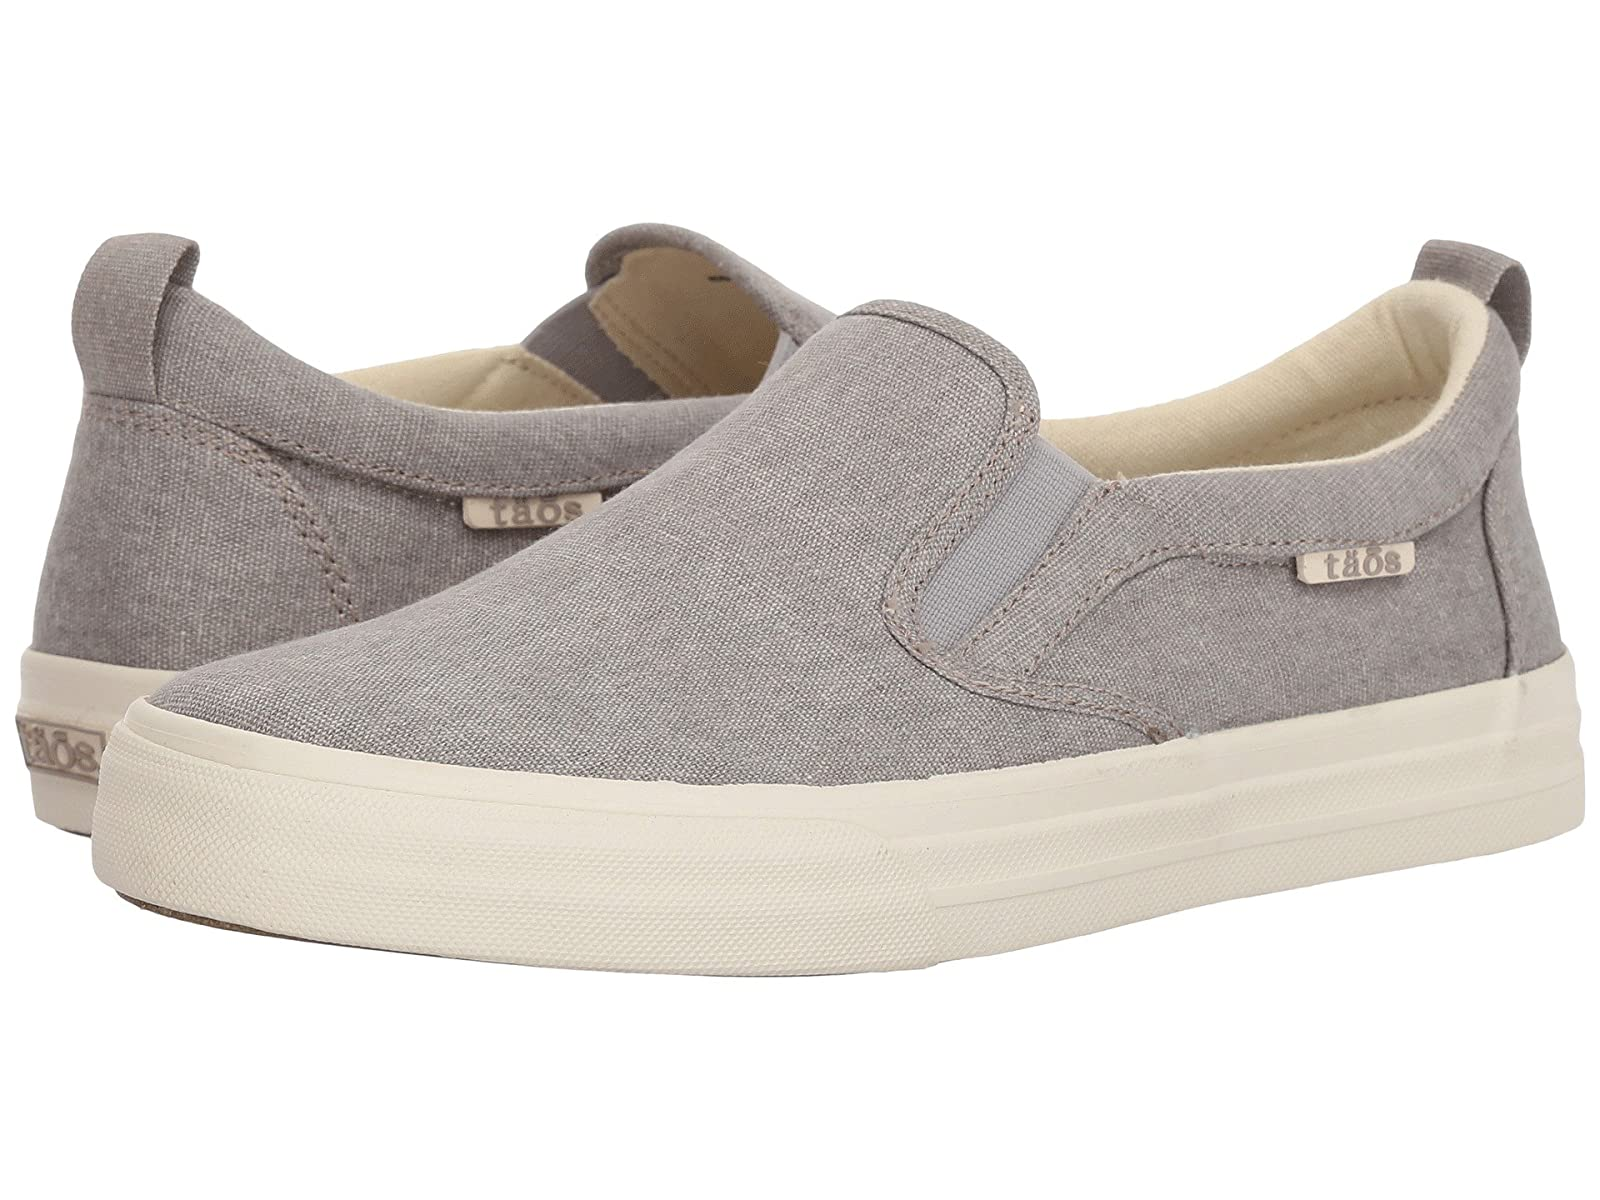 Taos Footwear Rubber SoulAtmospheric grades have affordable shoes